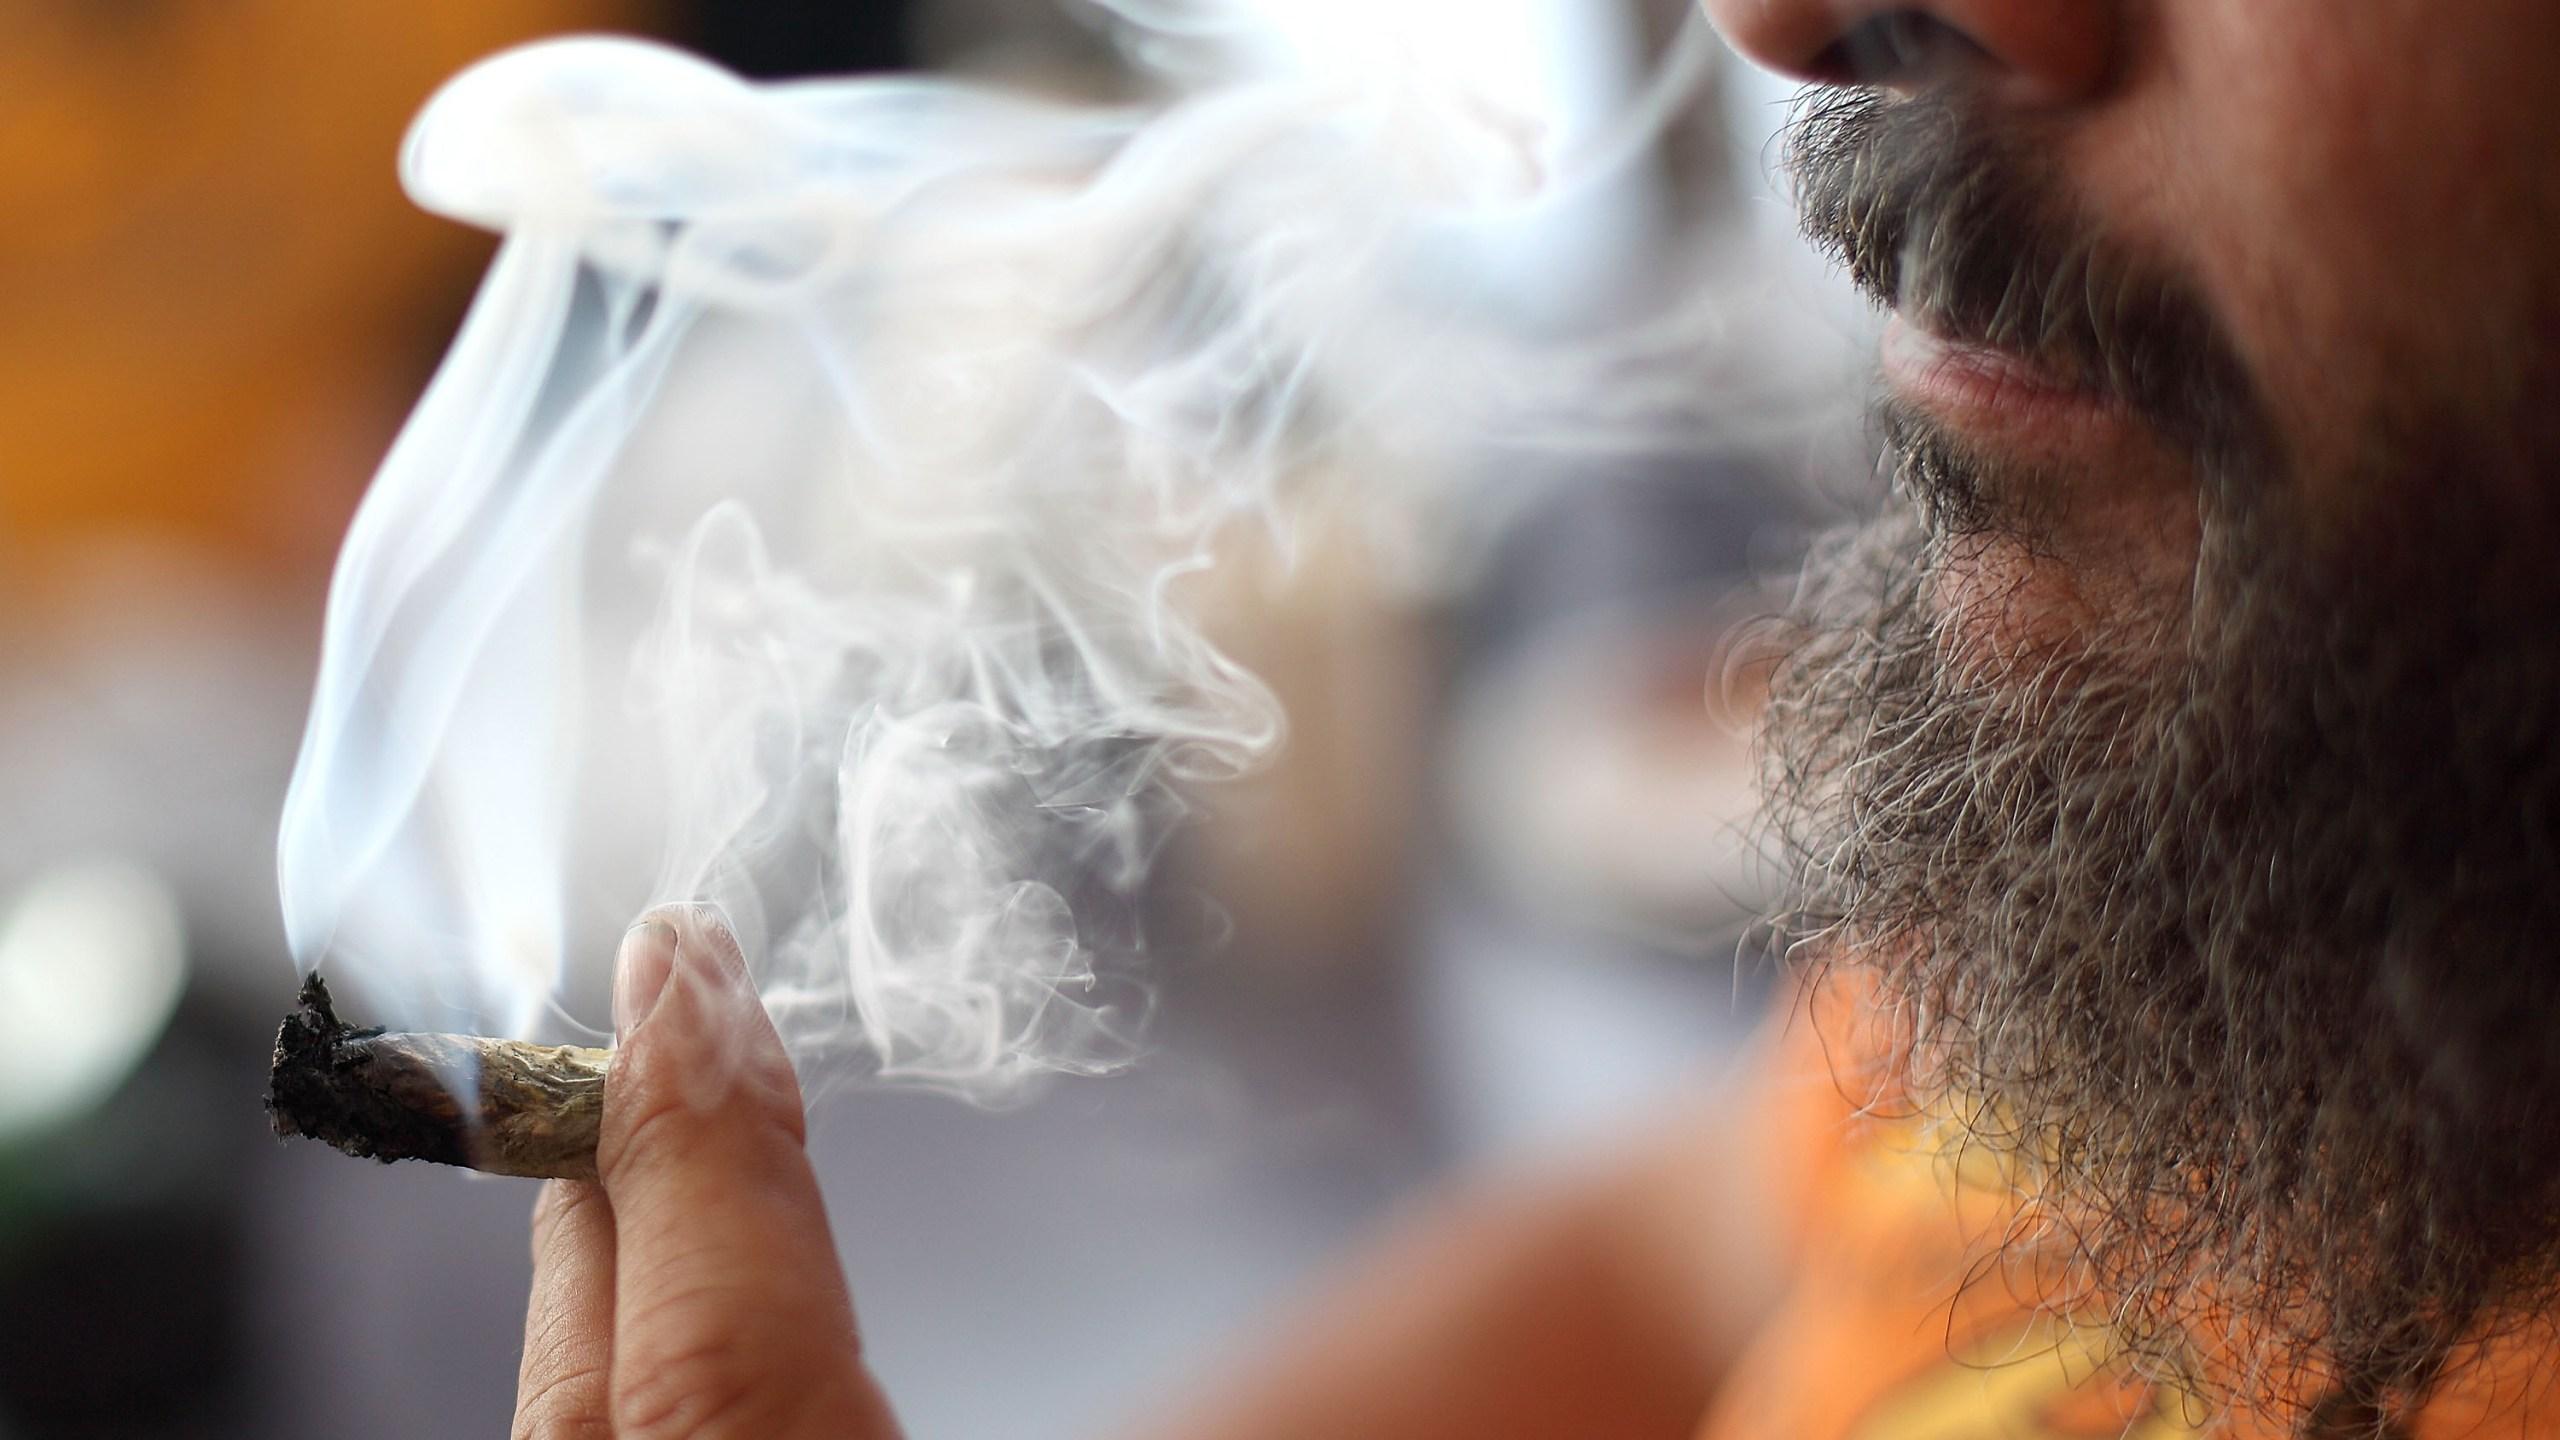 Medicinal marijuana user Dave Karp smokes the drug at the Berkeley Patients Group March 25, 2010, in Berkeley, Calif. (Credit: Justin Sullivan/Getty Images)